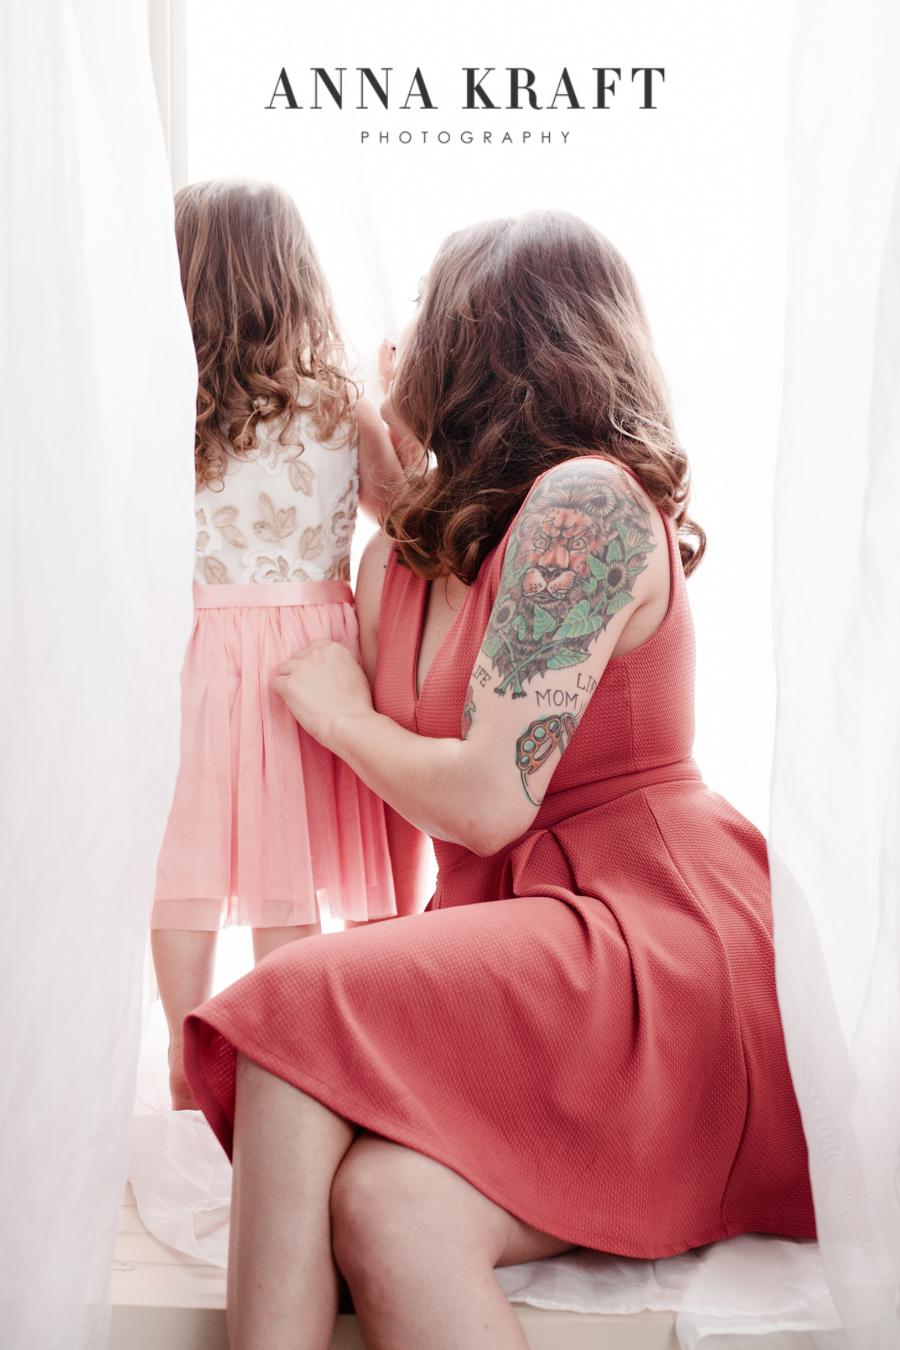 anna_kraft_photography_georgetown_square_studio_family_motherhood_daughter_portrait-13.jpg